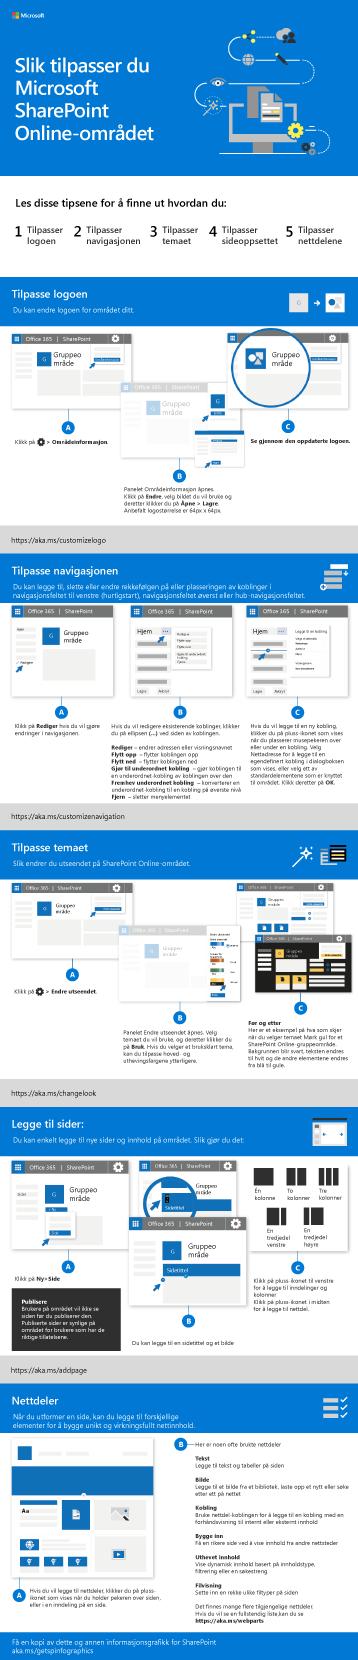 Tilpasse SharePoint-området